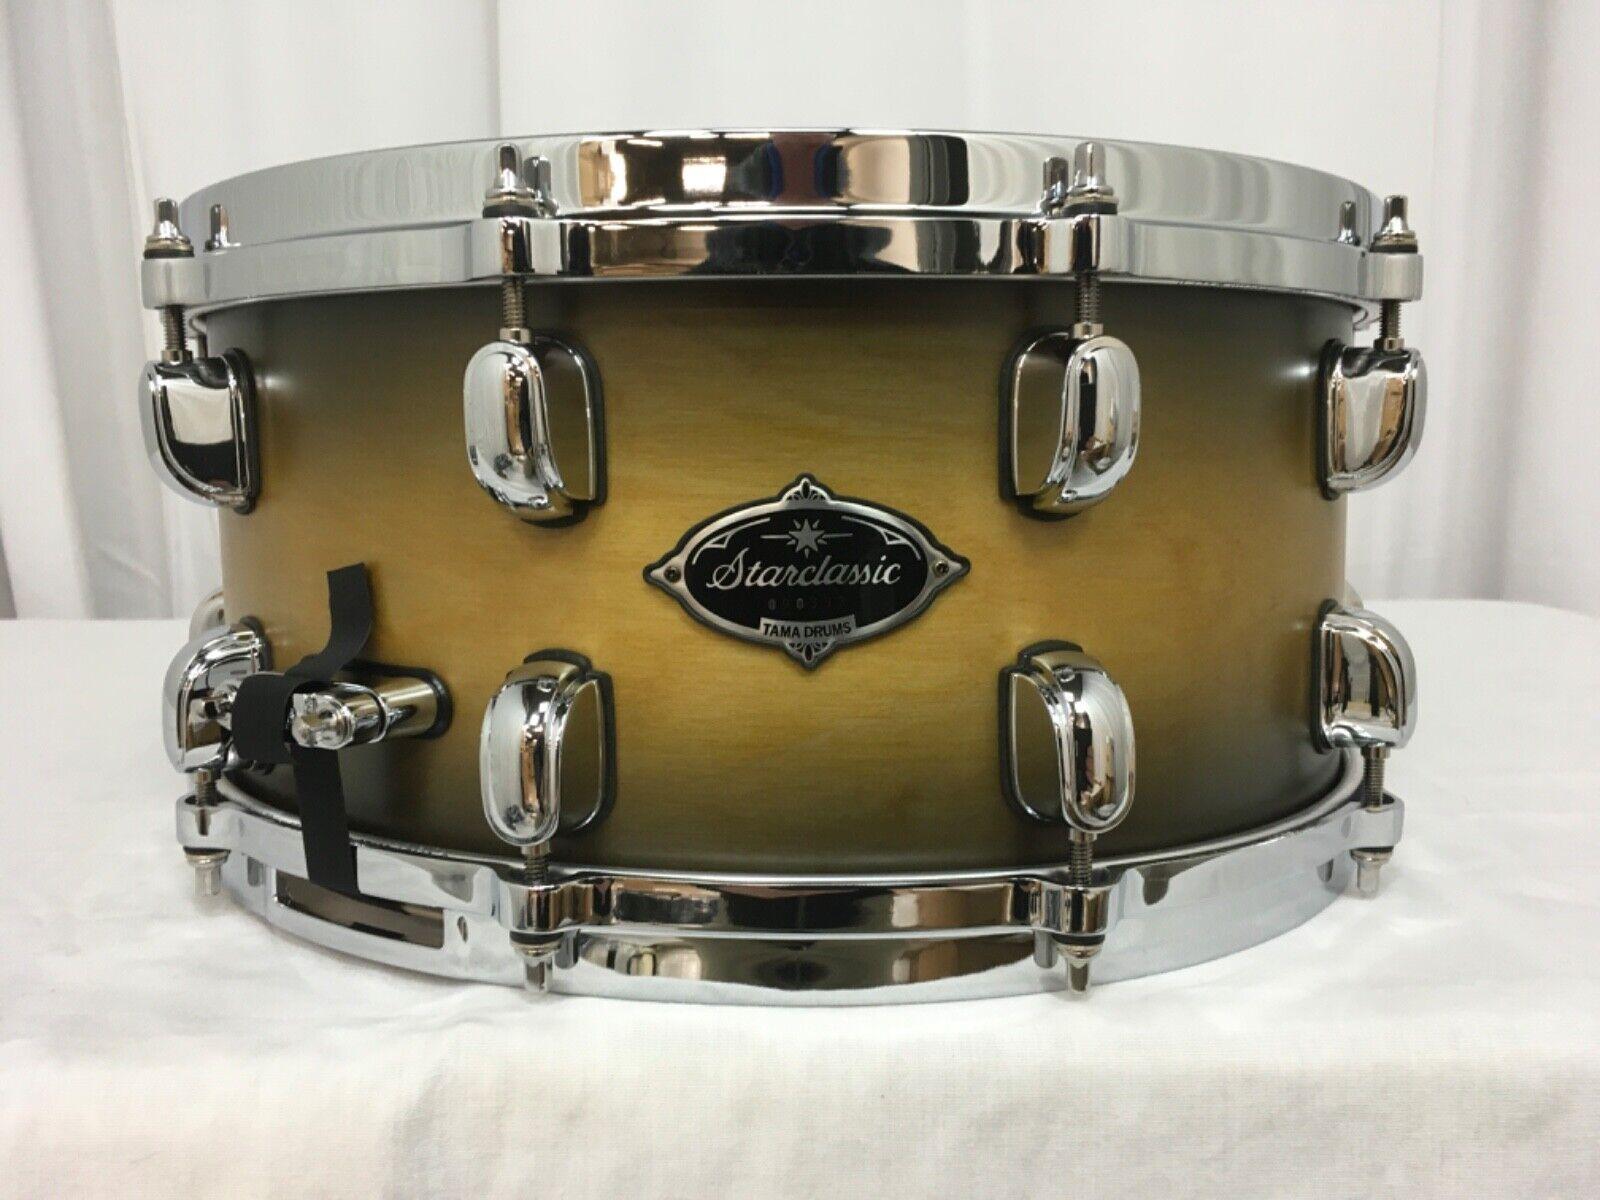 Tama Starclassic Birch Bubinga 14  X 6.5  Snare Drum Harvest Dusk Burst PLS65HDB